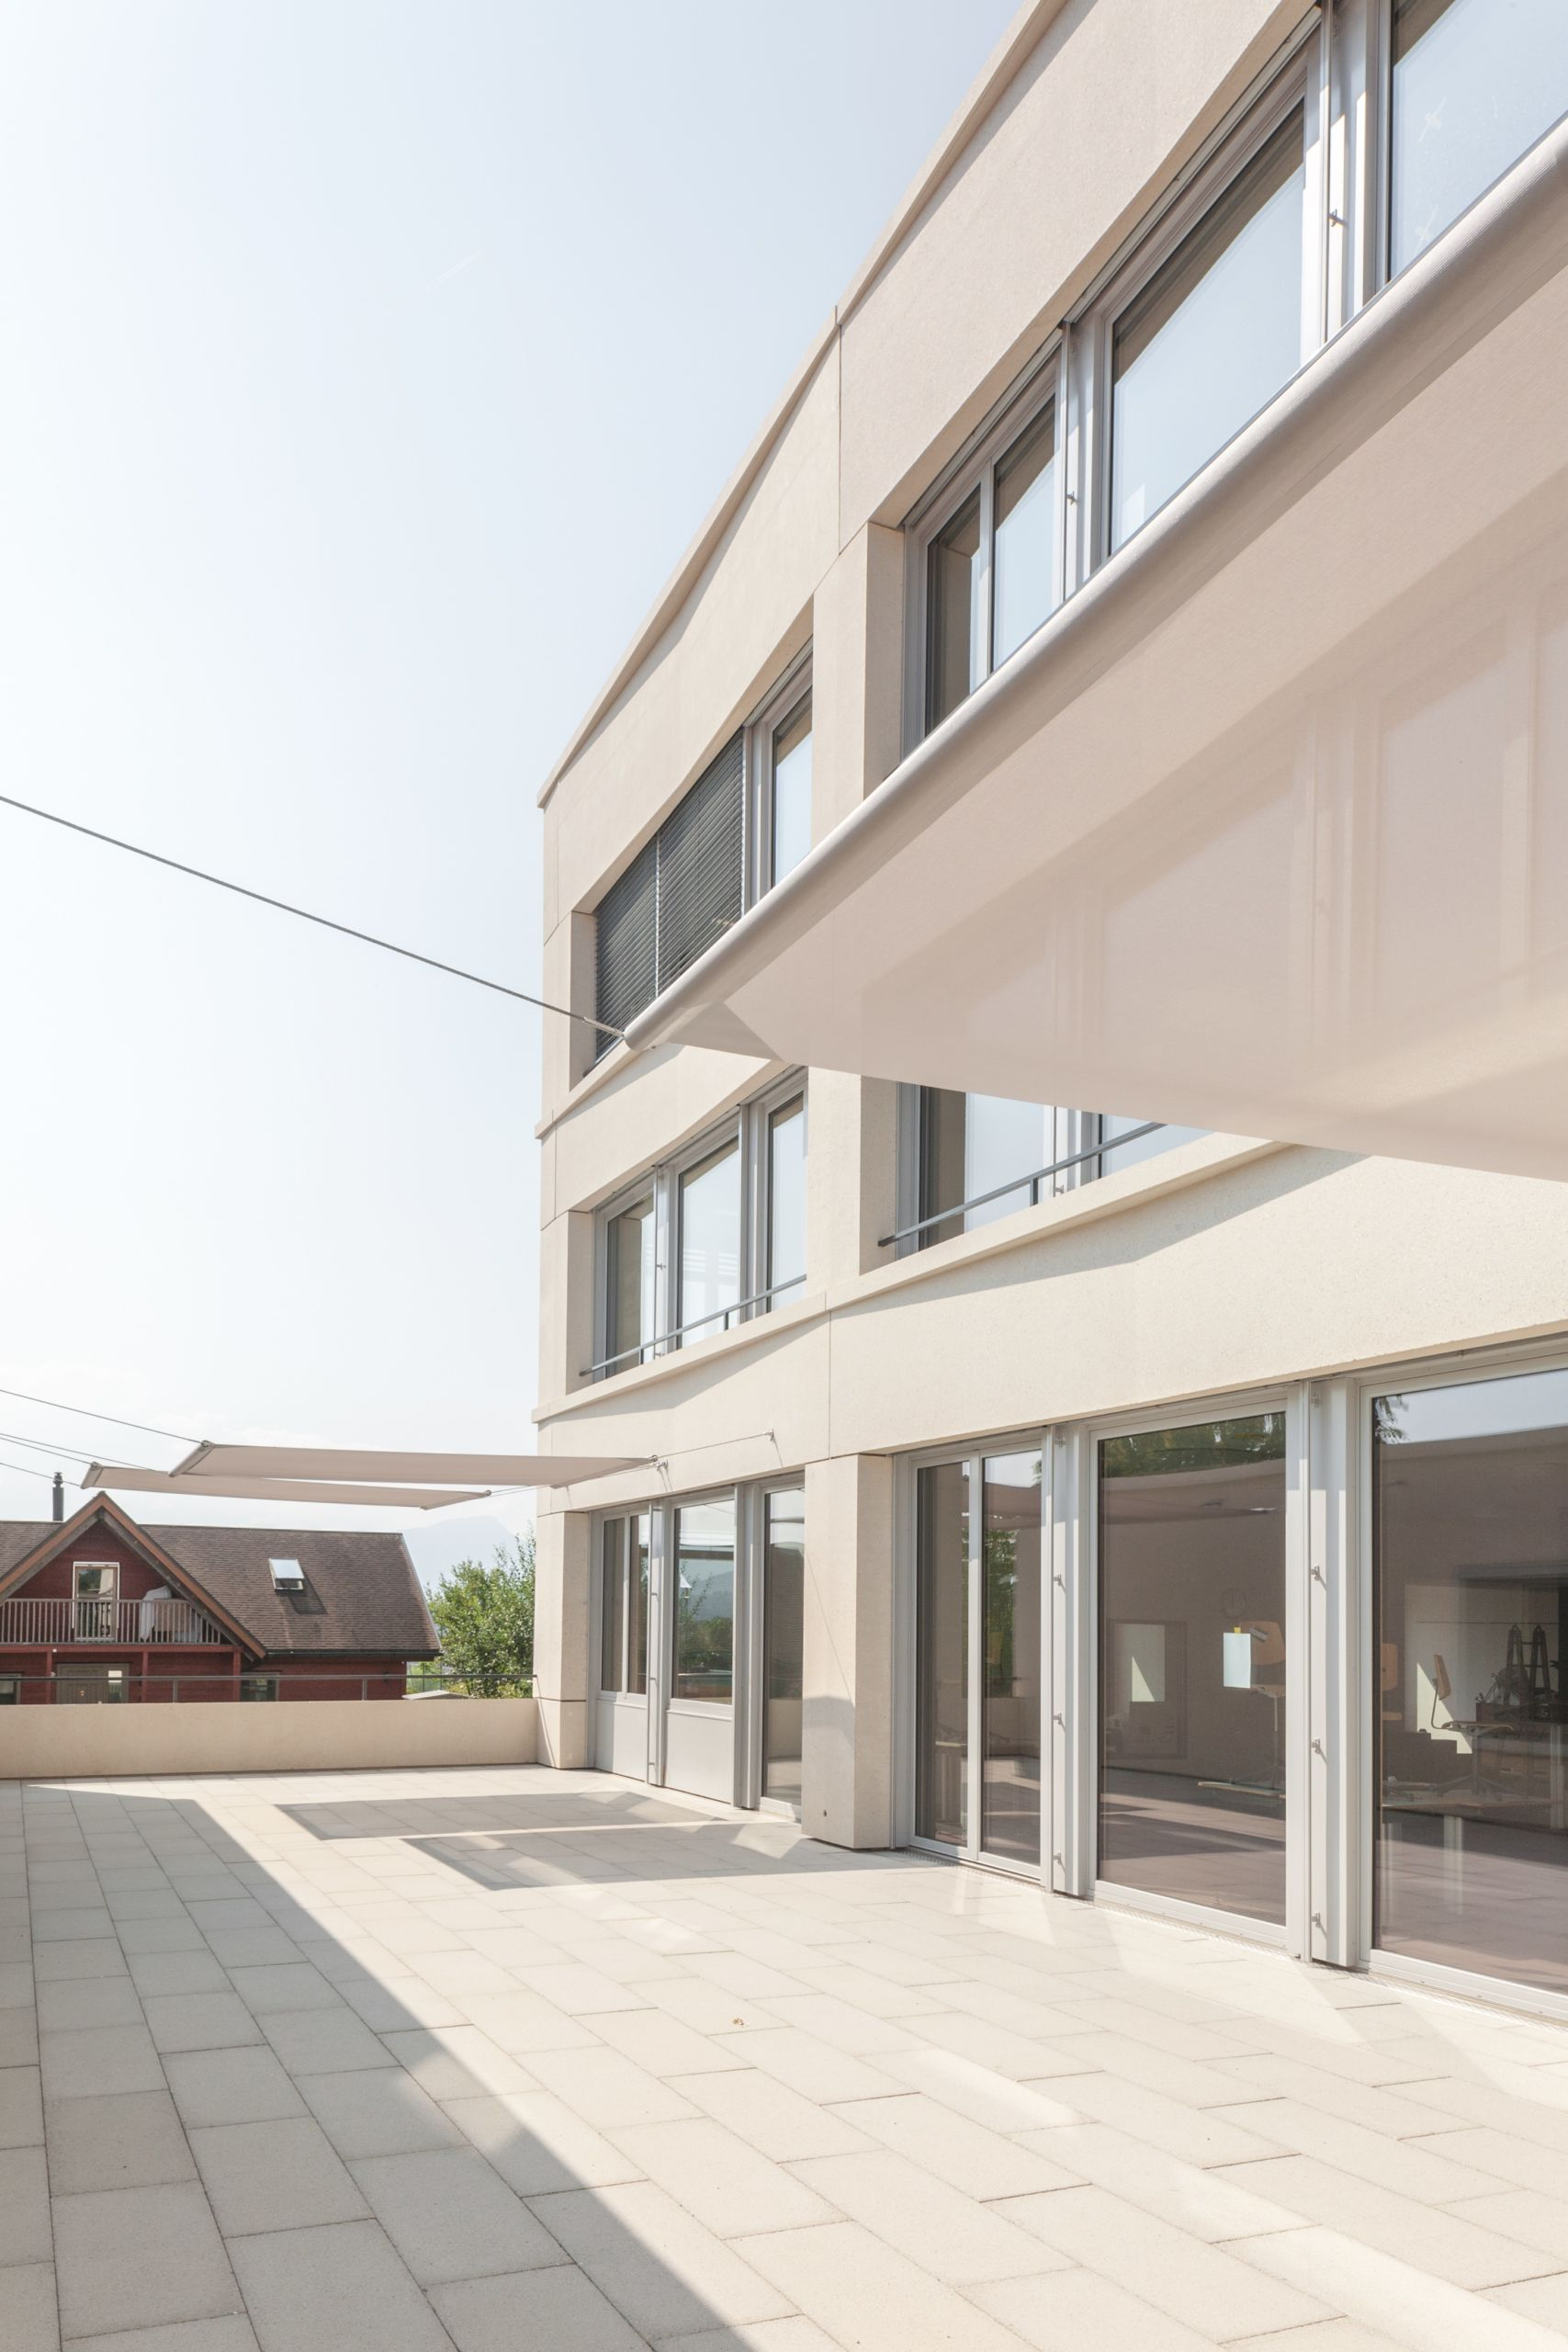 Schulhaus lindau rothenburg mosimann partner ag - Architekten lindau ...